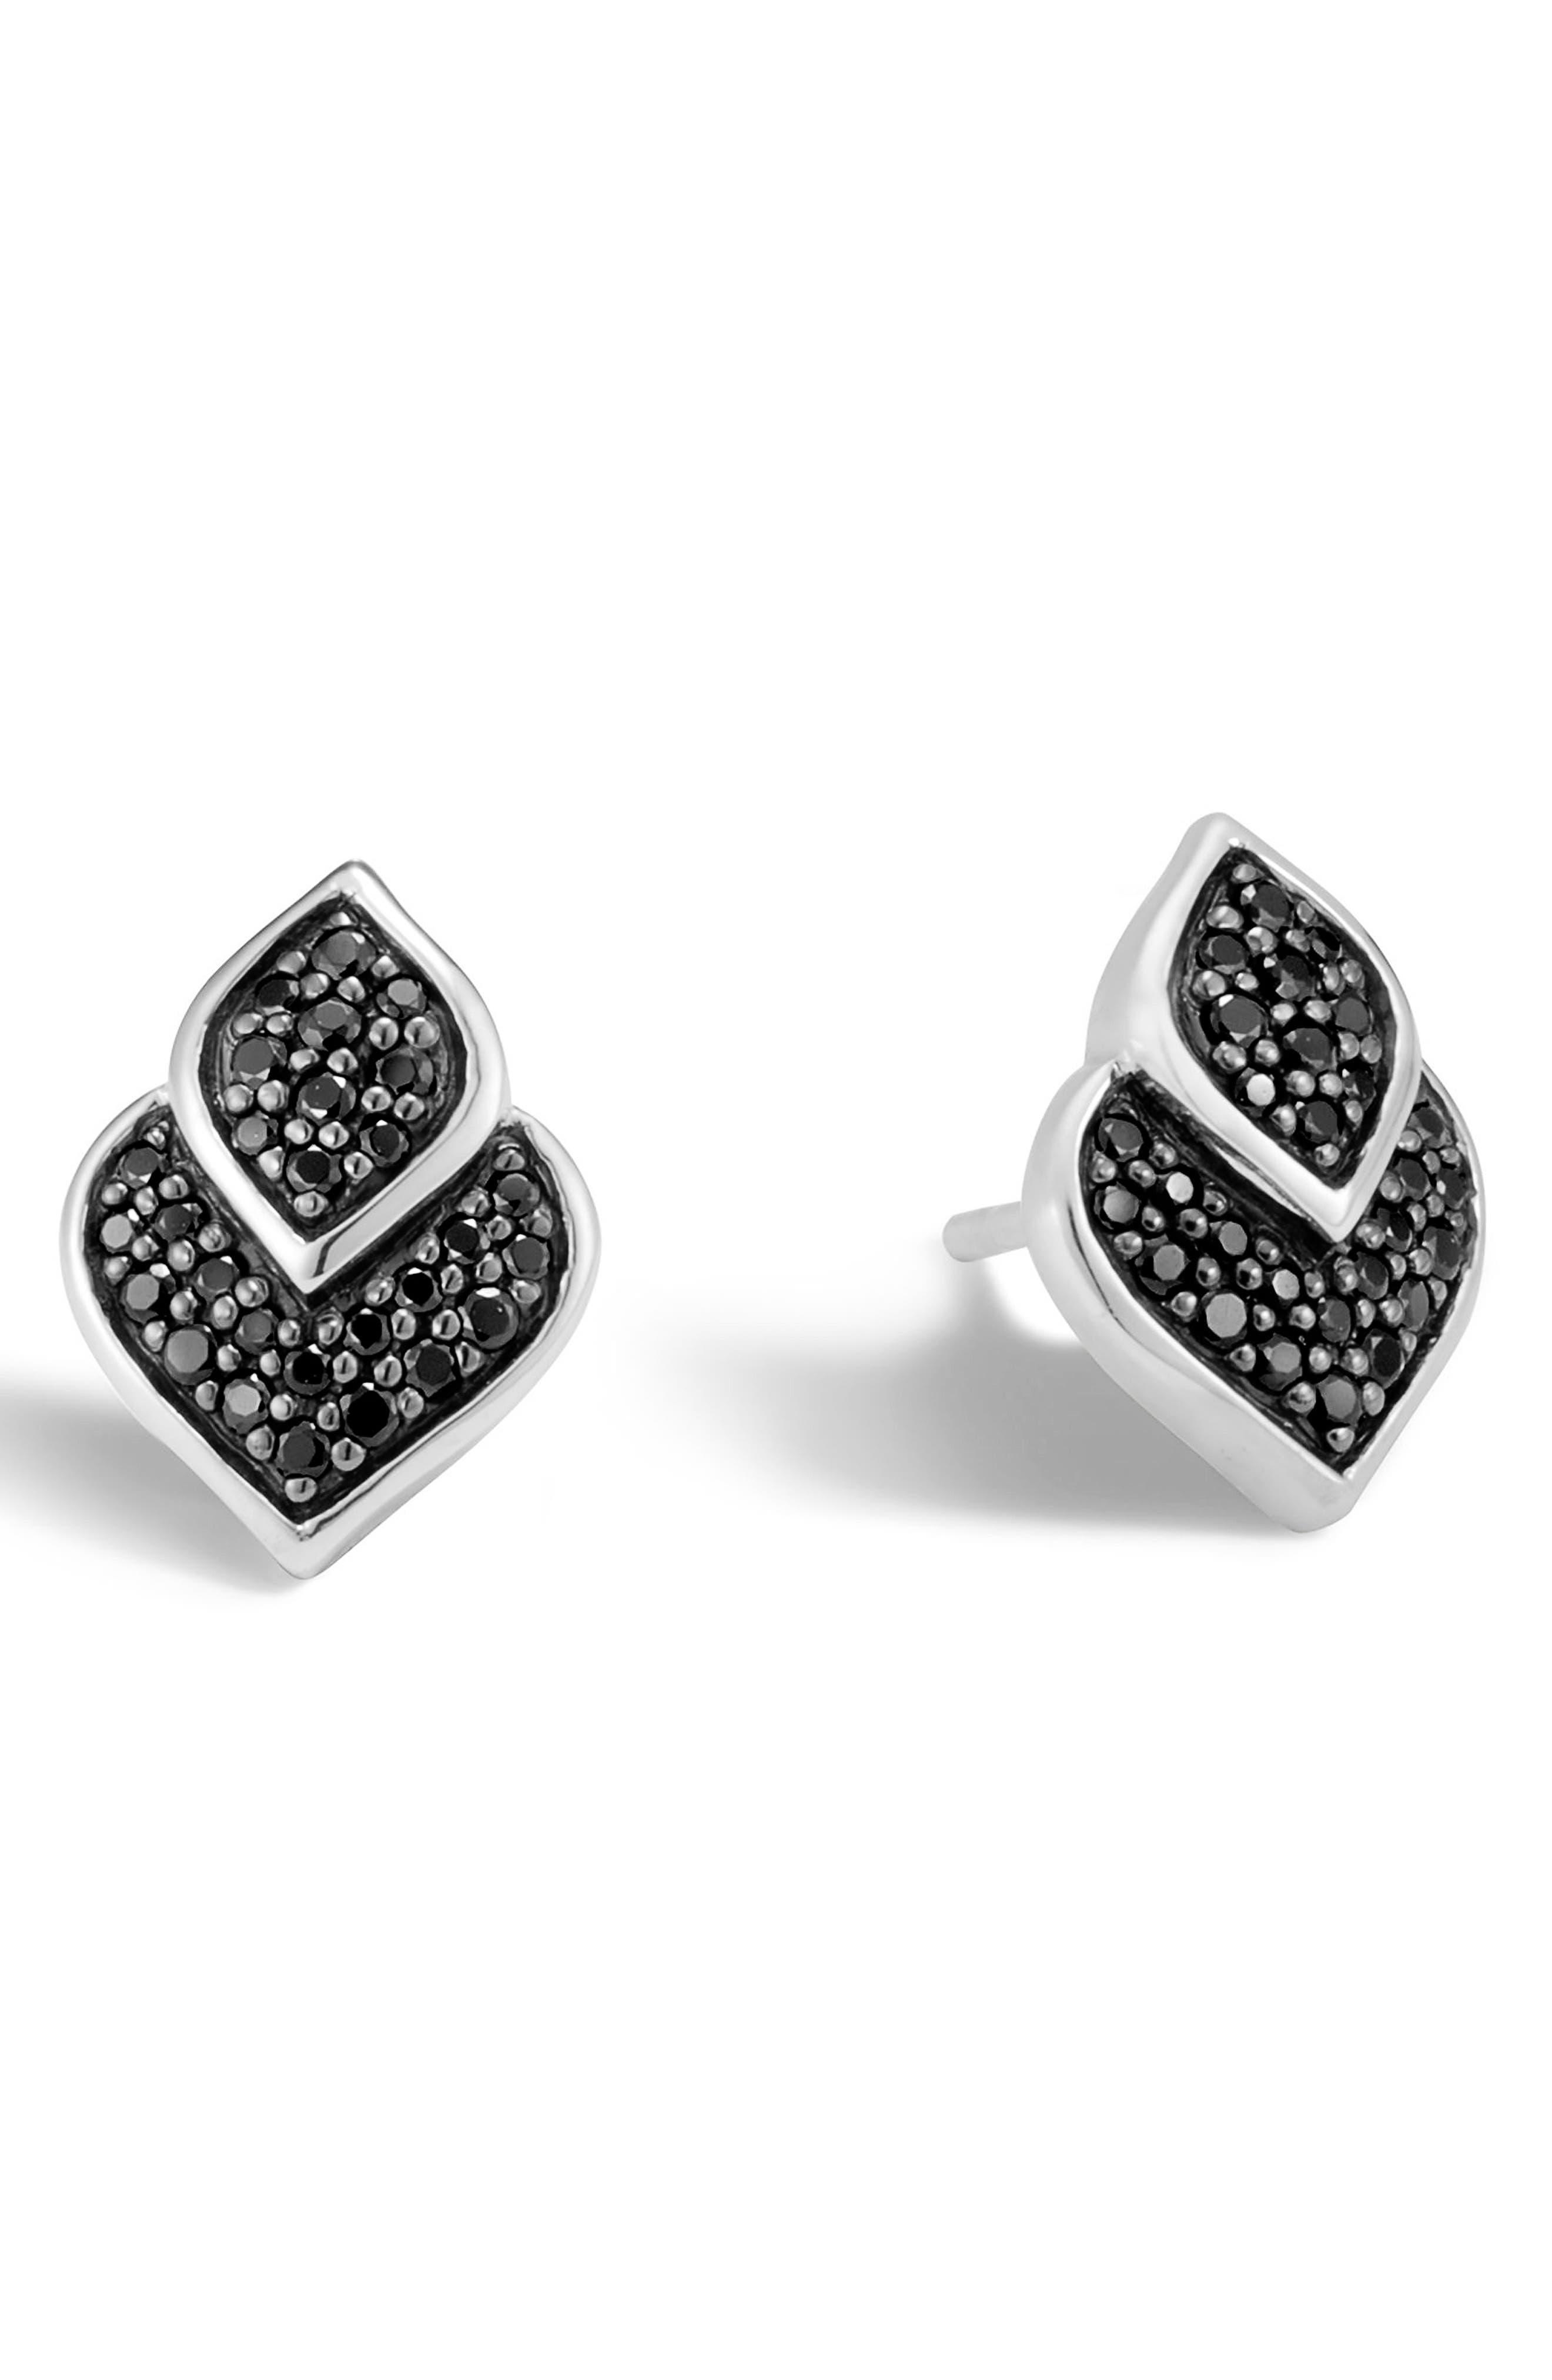 Legends Naga Stud Earrings,                         Main,                         color, Silver/ Black Sapphire